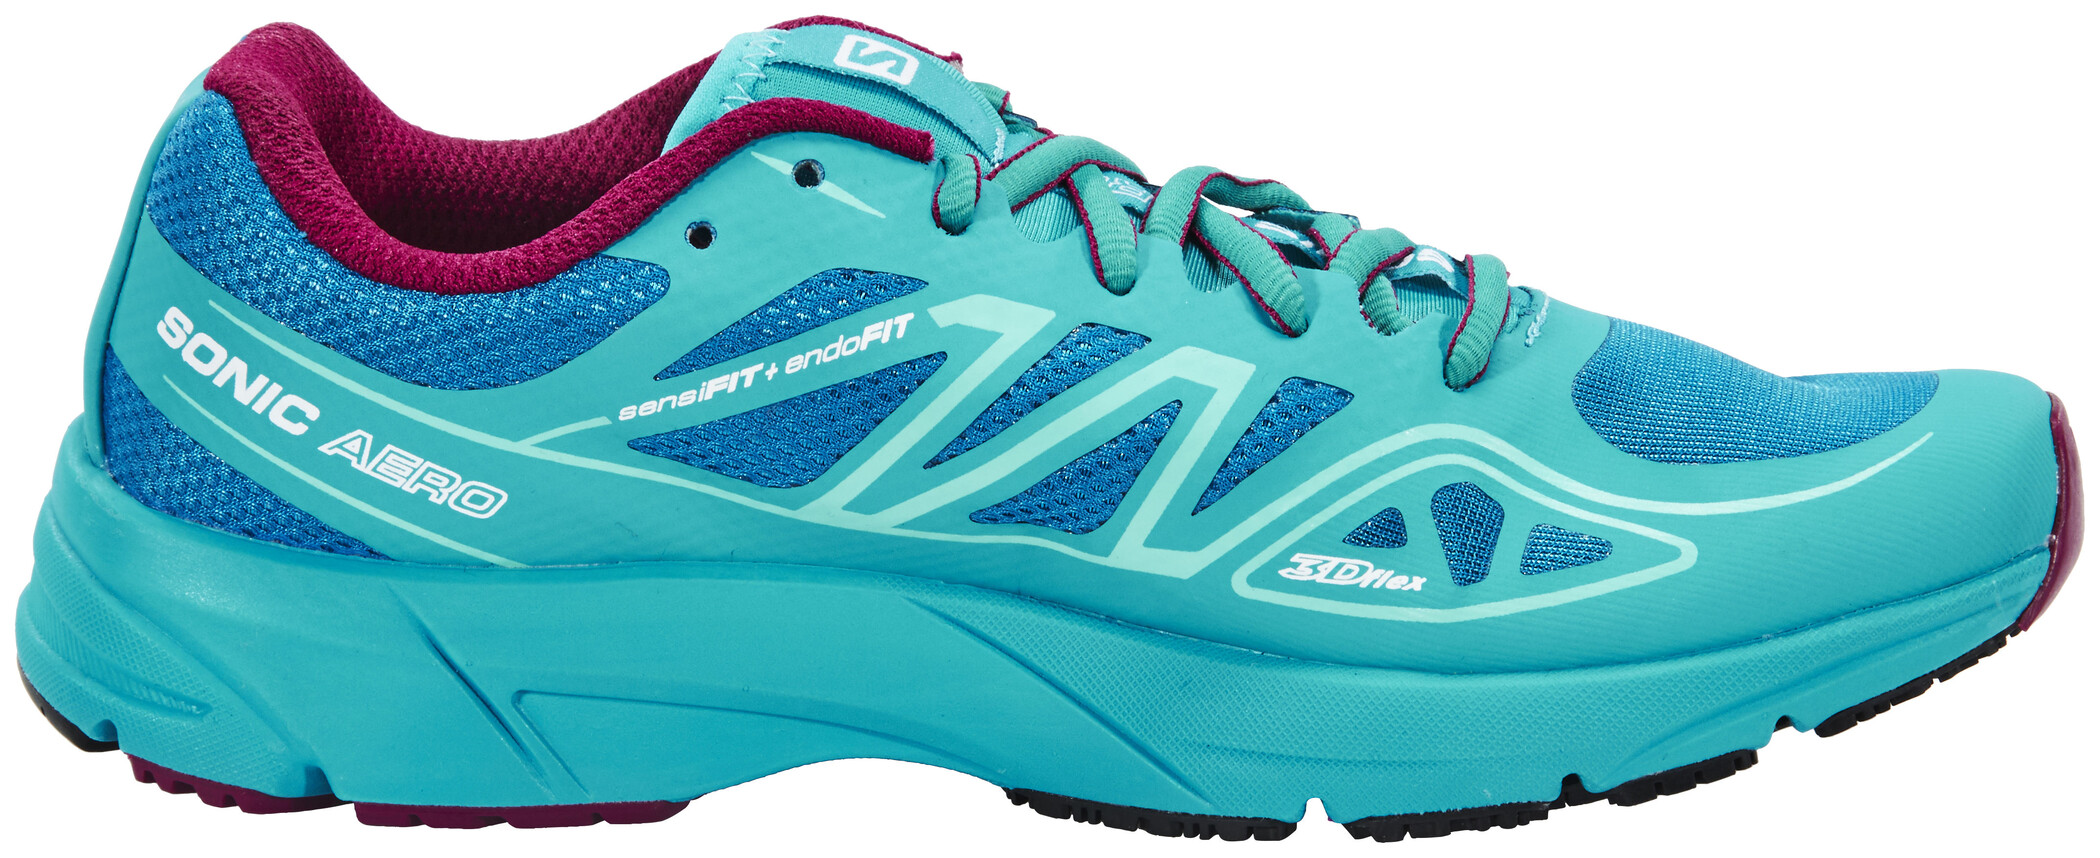 Special Supply Salomon X scream 3d Teal Blue Trail Running